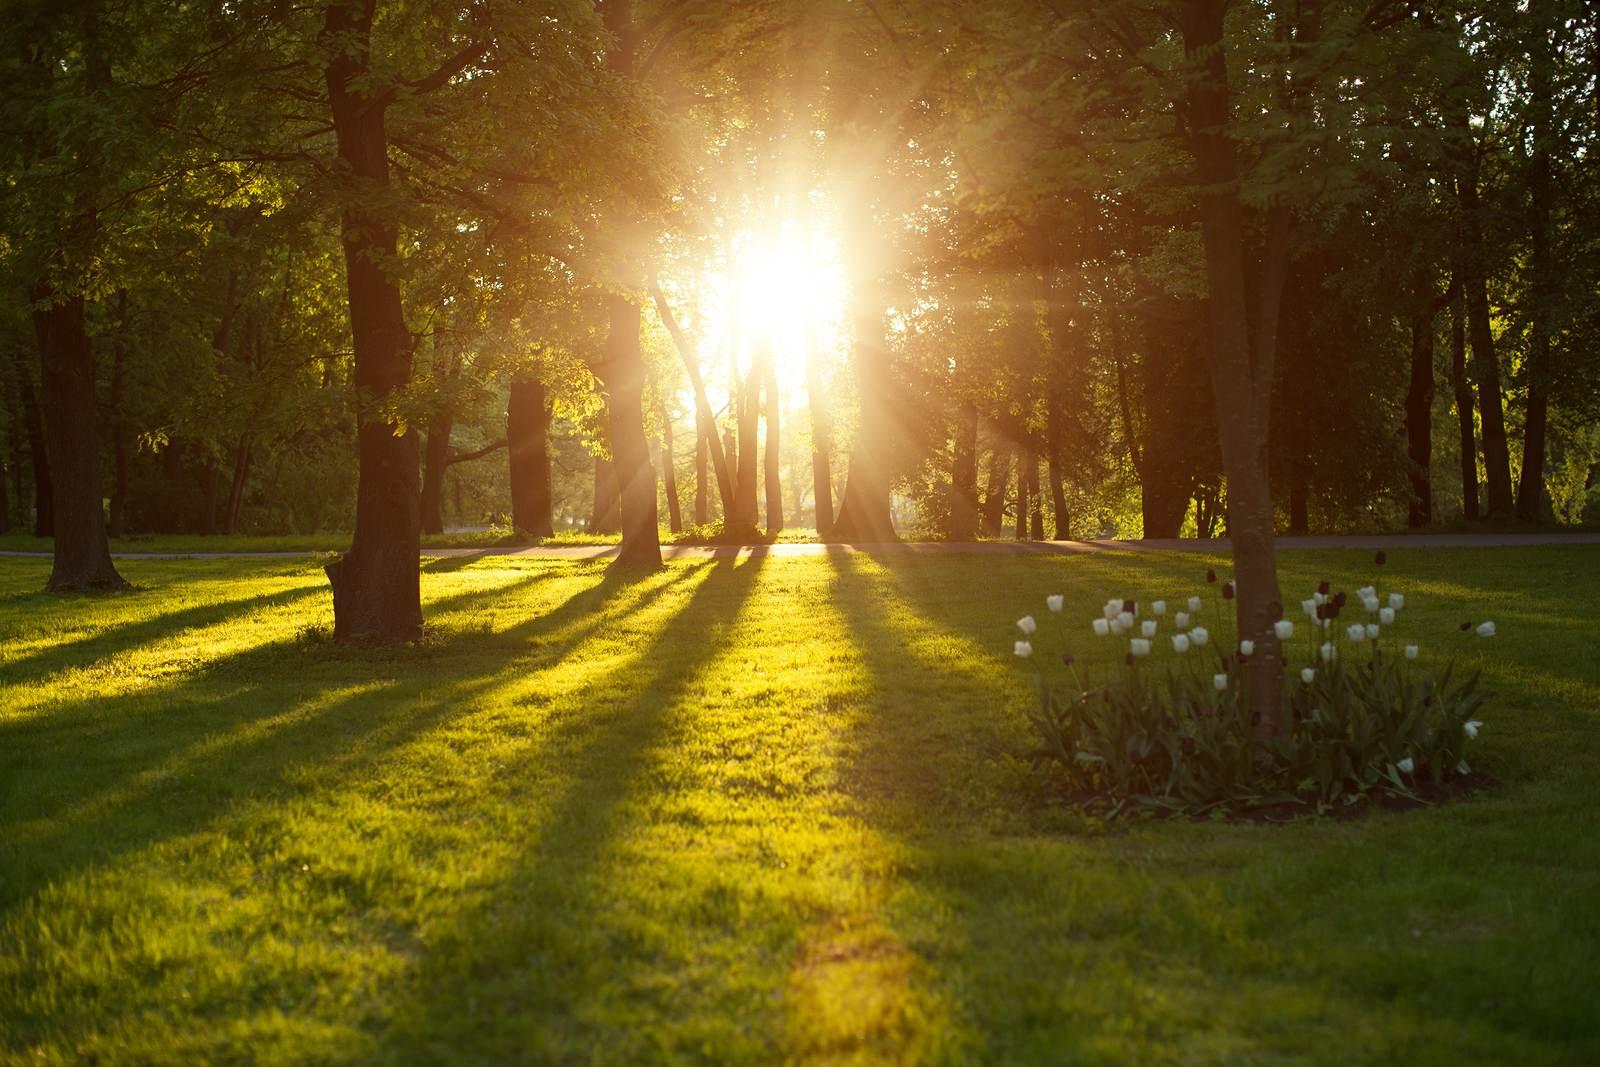 Natural Light Sources For Kids